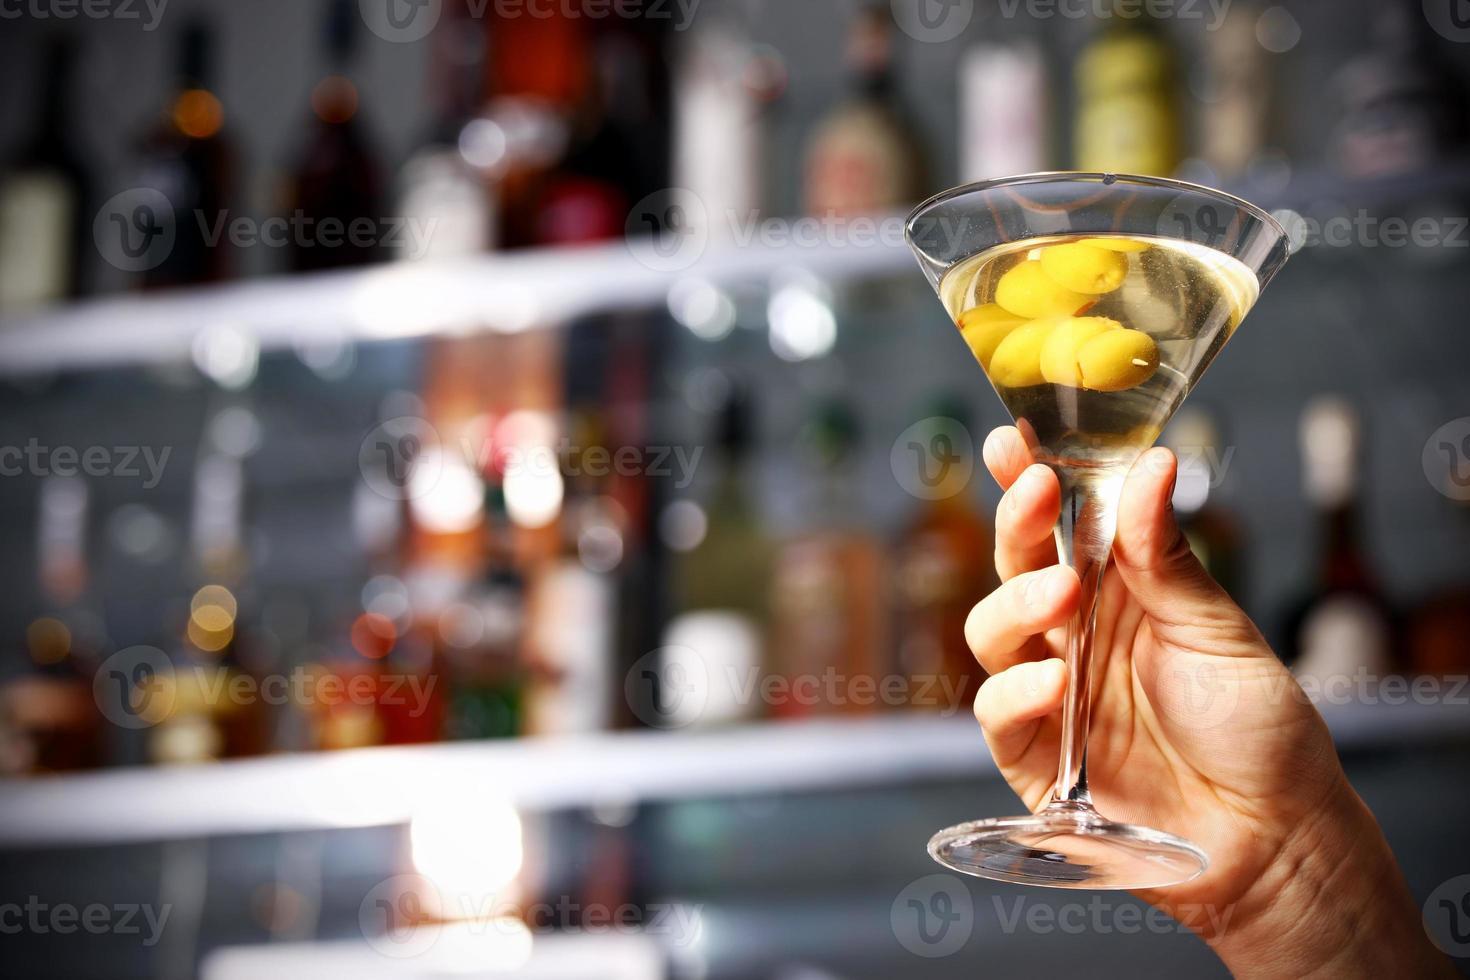 sosteniendo la bebida en la mano foto